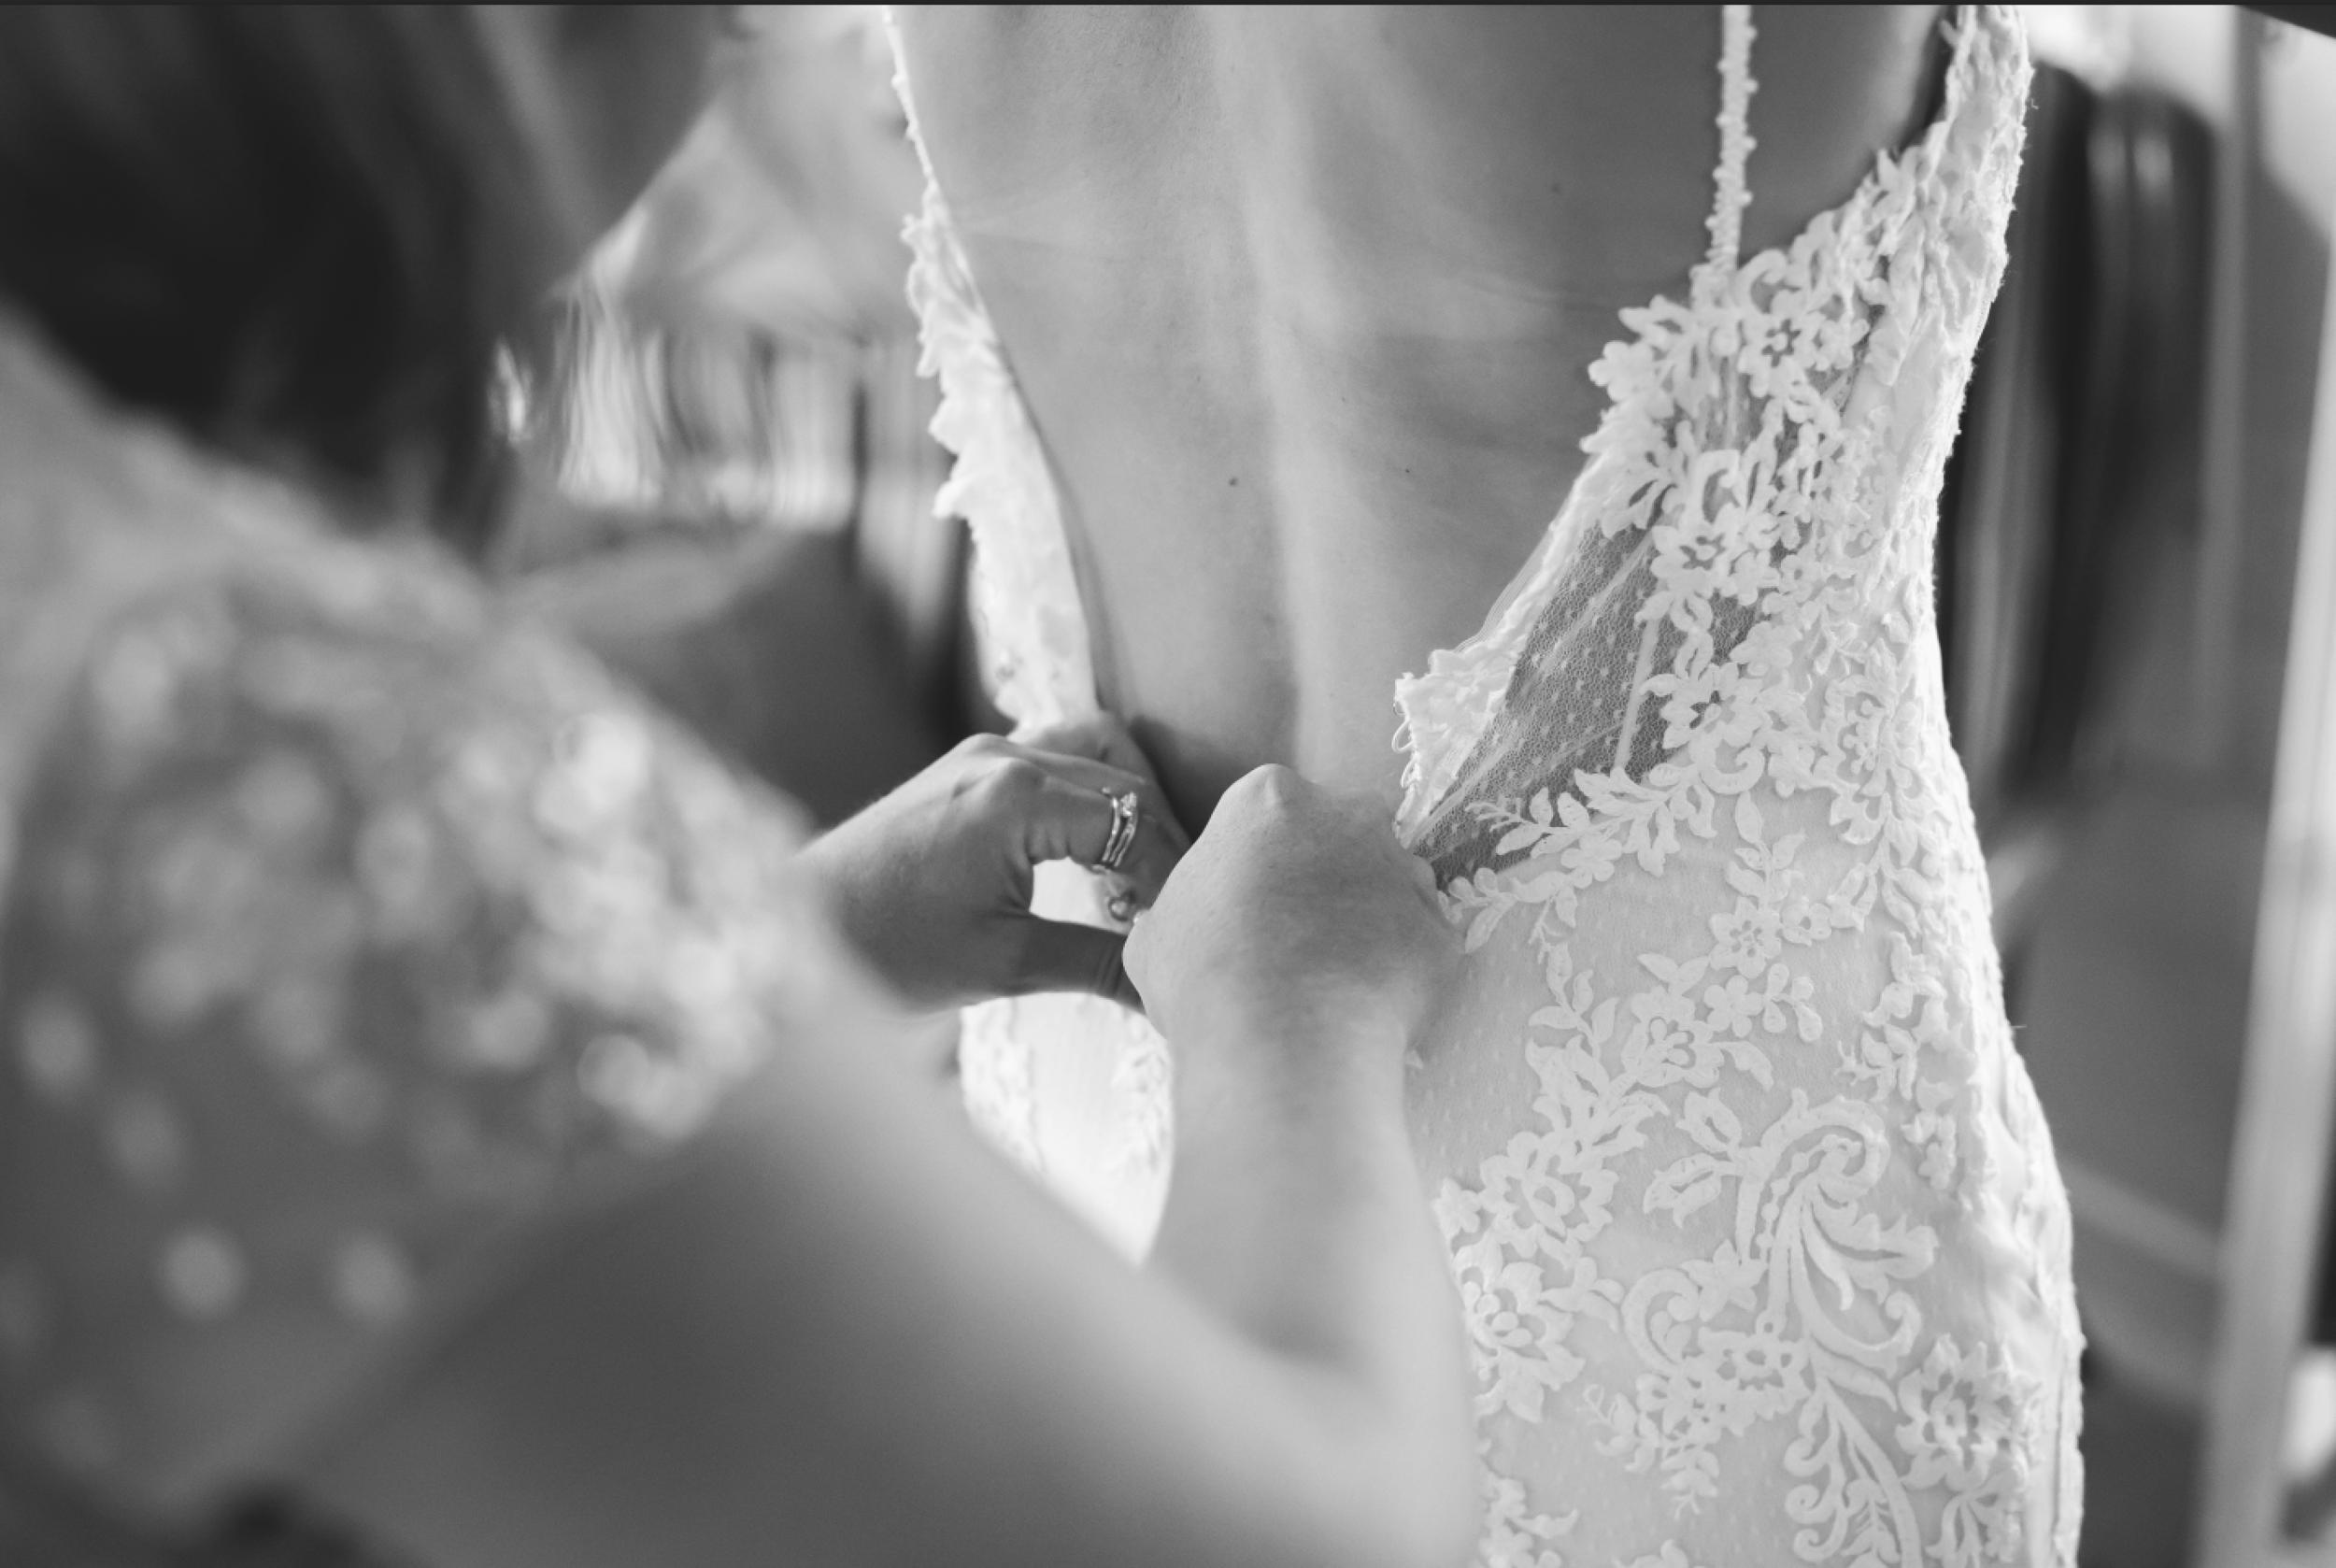 Wedding-Photos-Muskoka-Clevelands-House-Photographer-Wedding-Hamilton-GTA-Niagara-Oakville-Moments-by-Lauren-Photography-Photo-Image-4.png